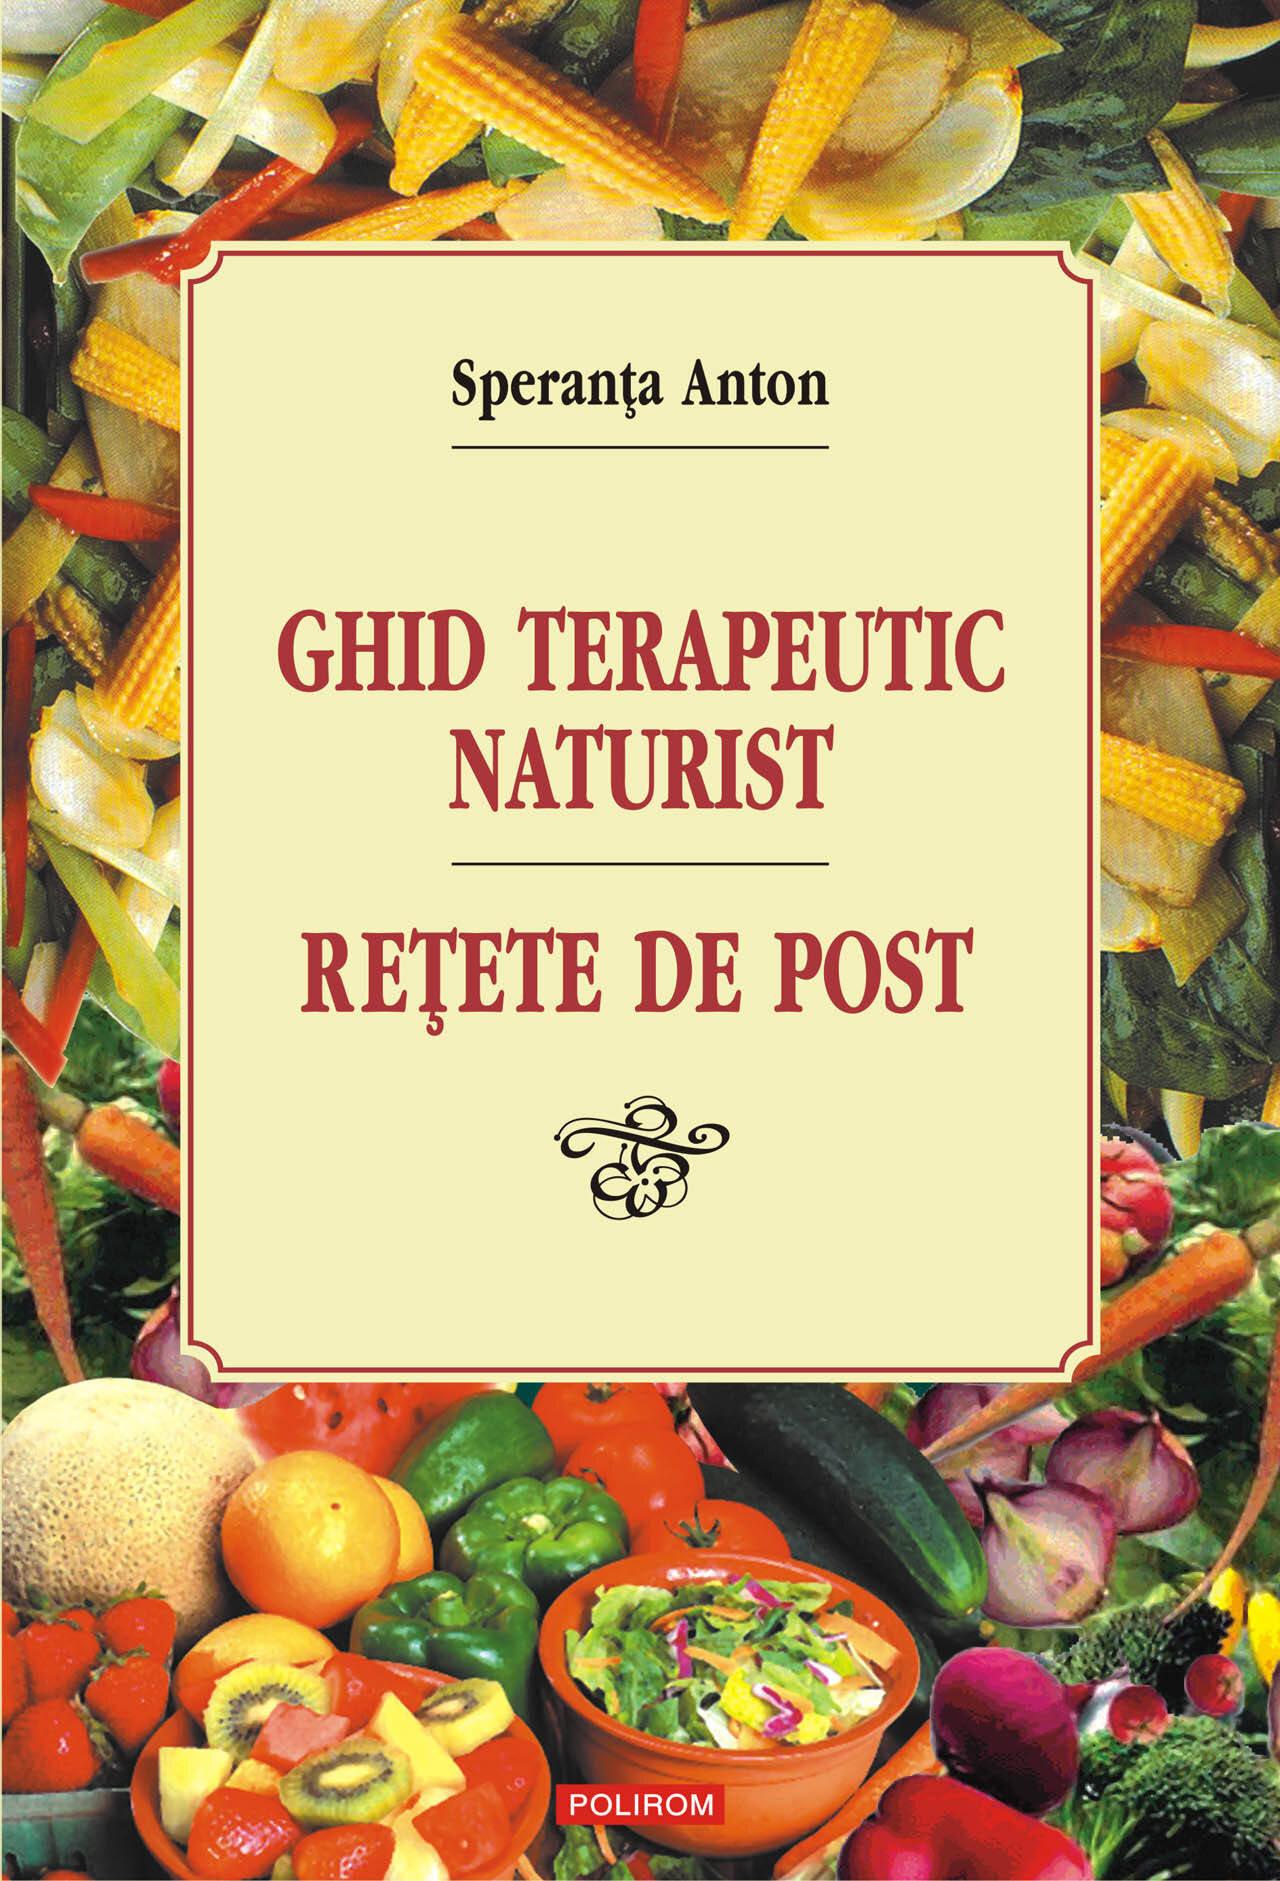 Ghid terapeutic naturist: retete de post (eBook)